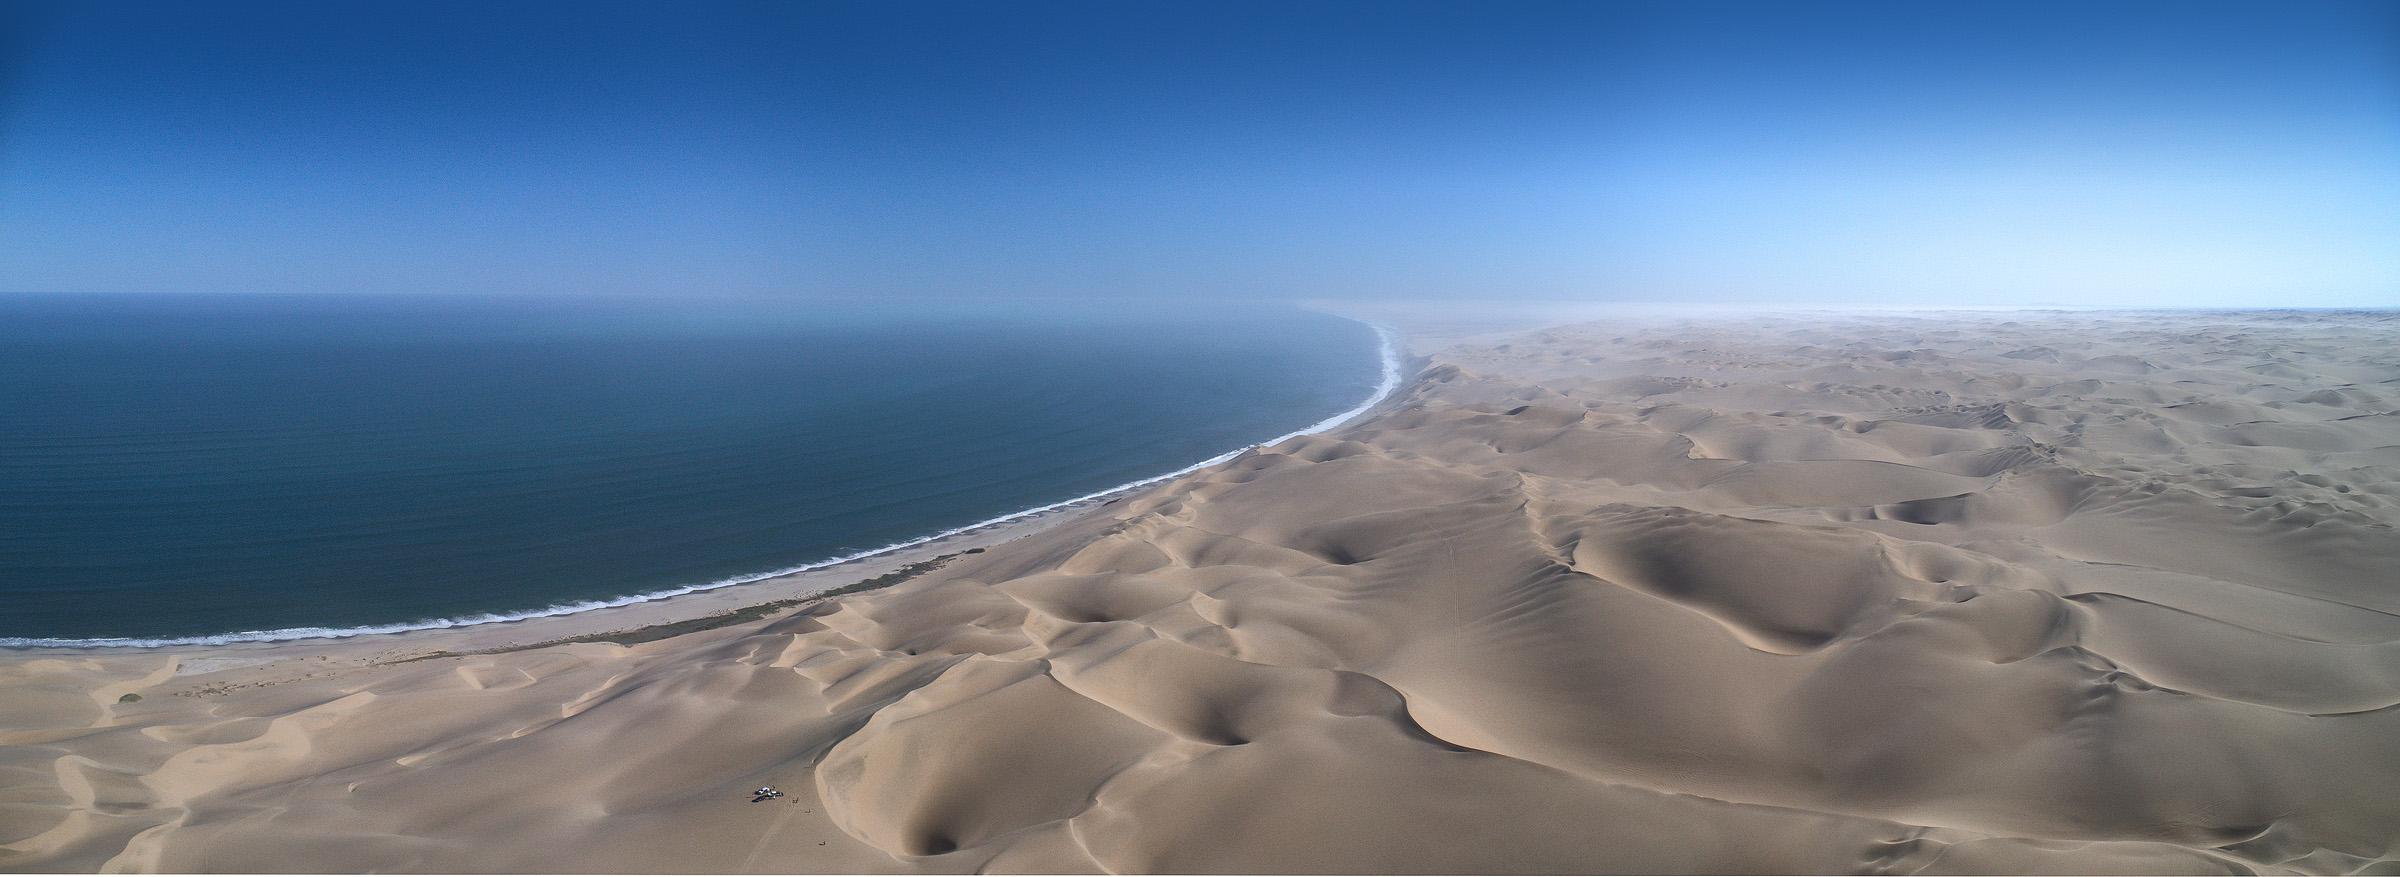 Skeleton Coast National Park, Namibia